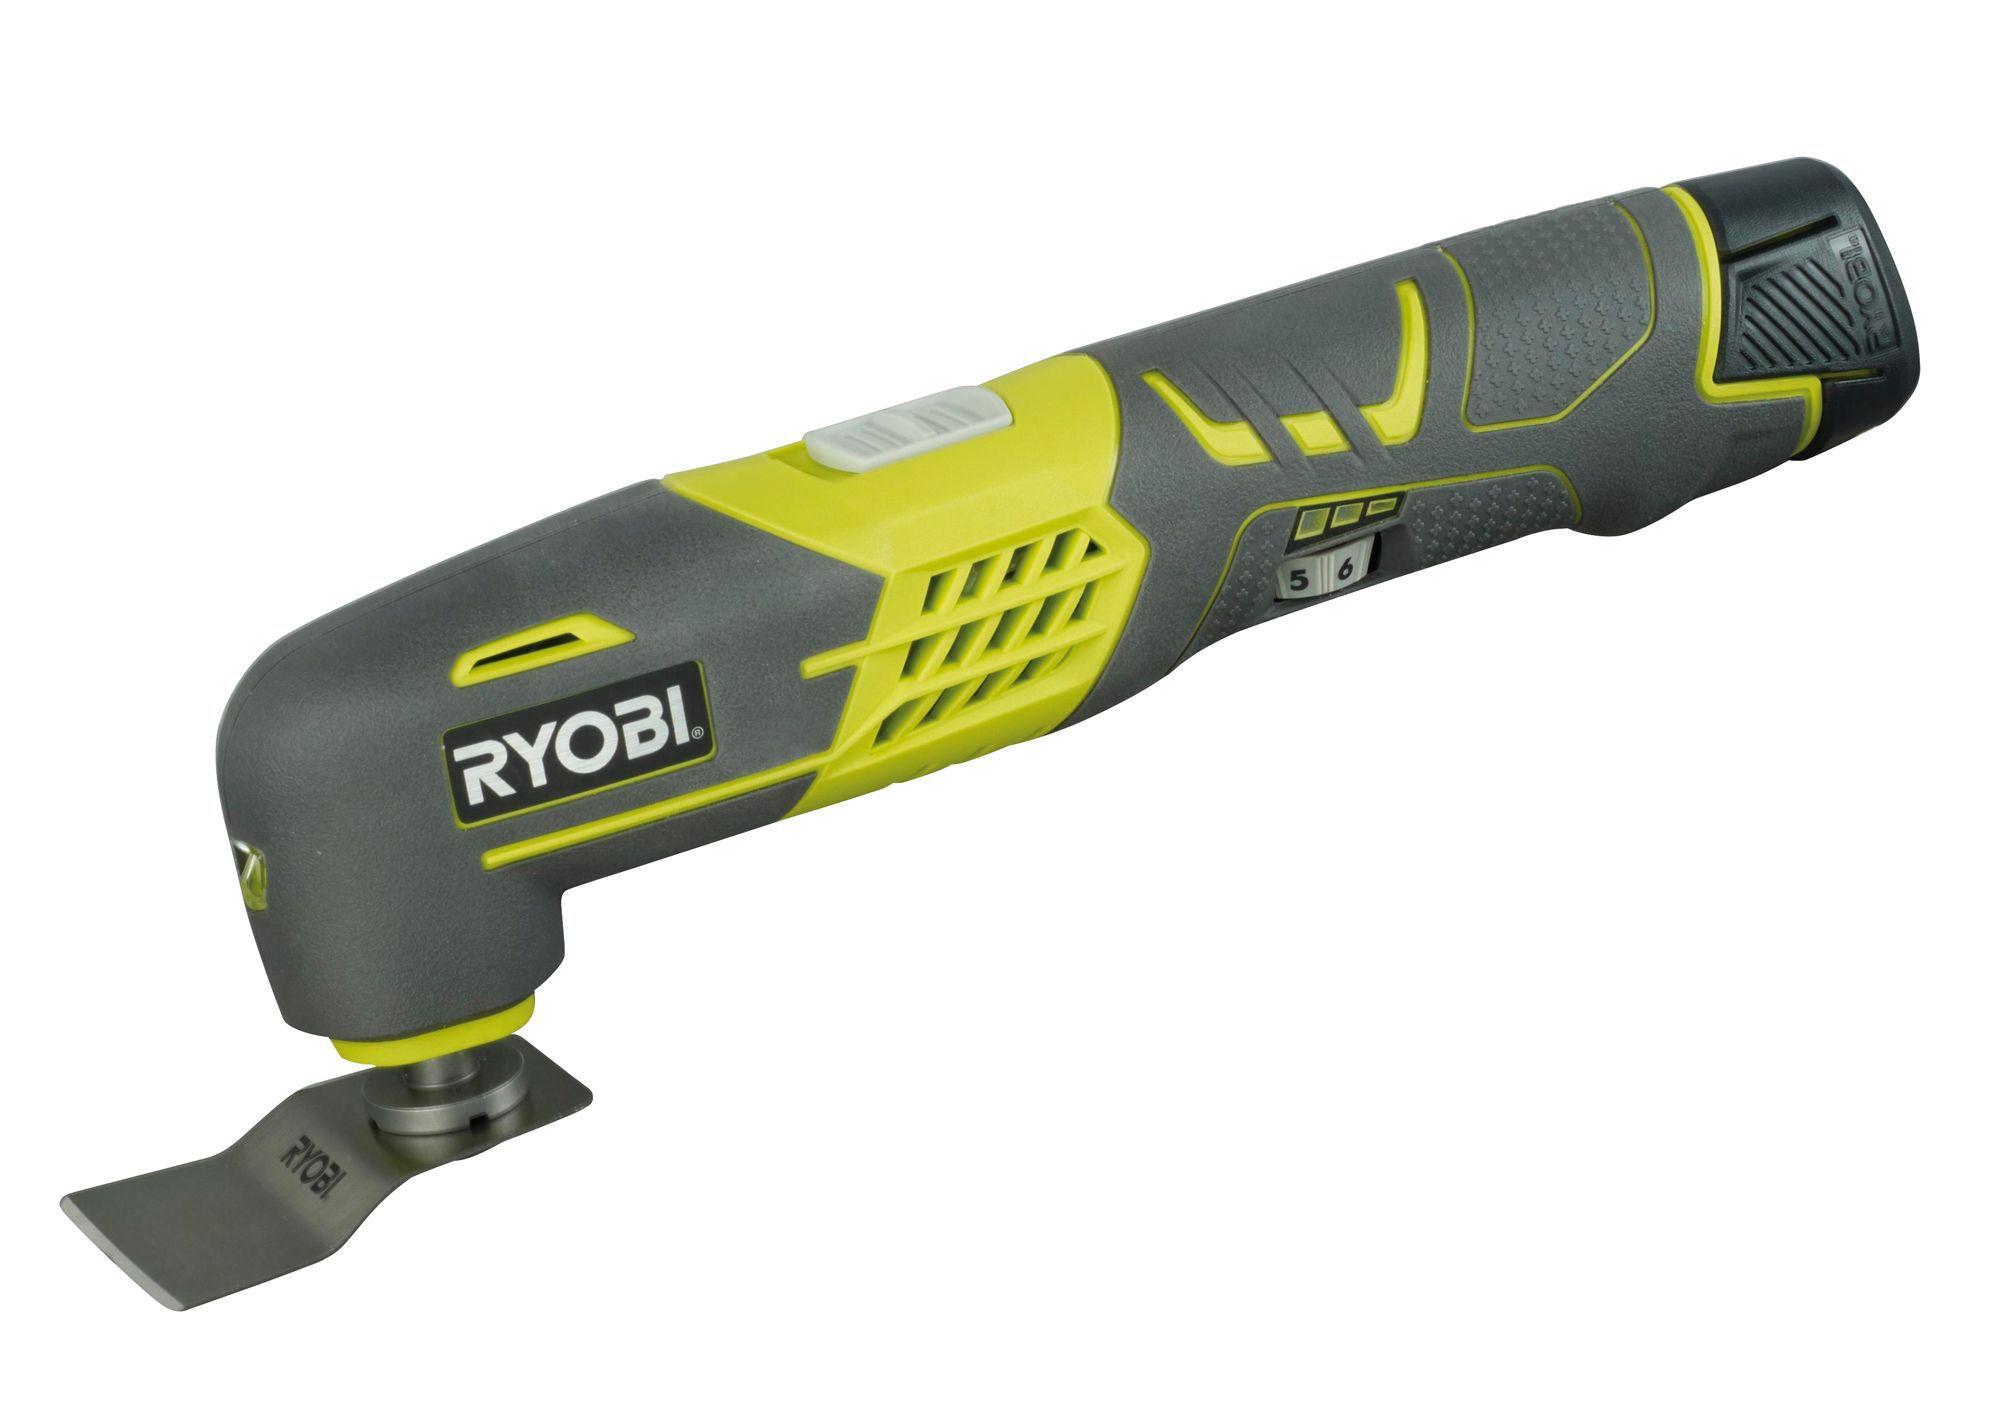 ryobi 12v cordless multi tool rmt12011l multi tools. Black Bedroom Furniture Sets. Home Design Ideas